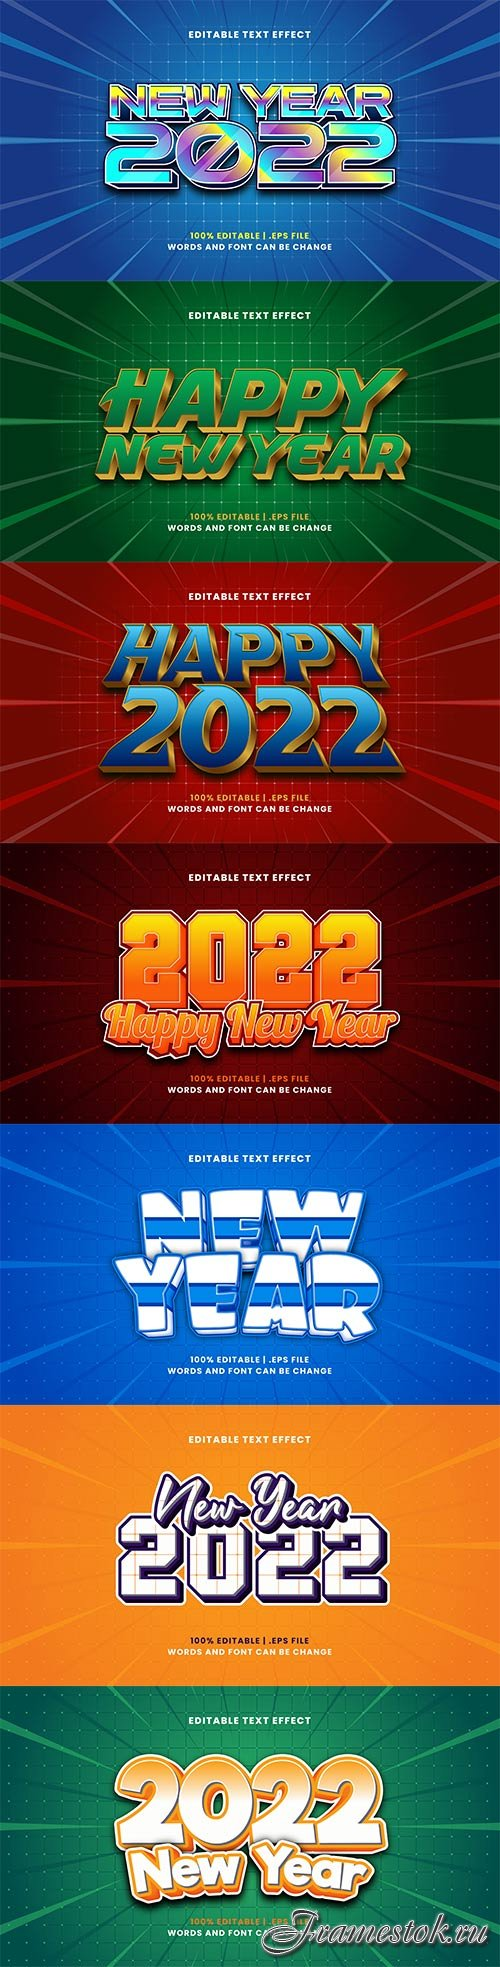 2022 New year, Merry christmas editable text effect premium vector vol 15